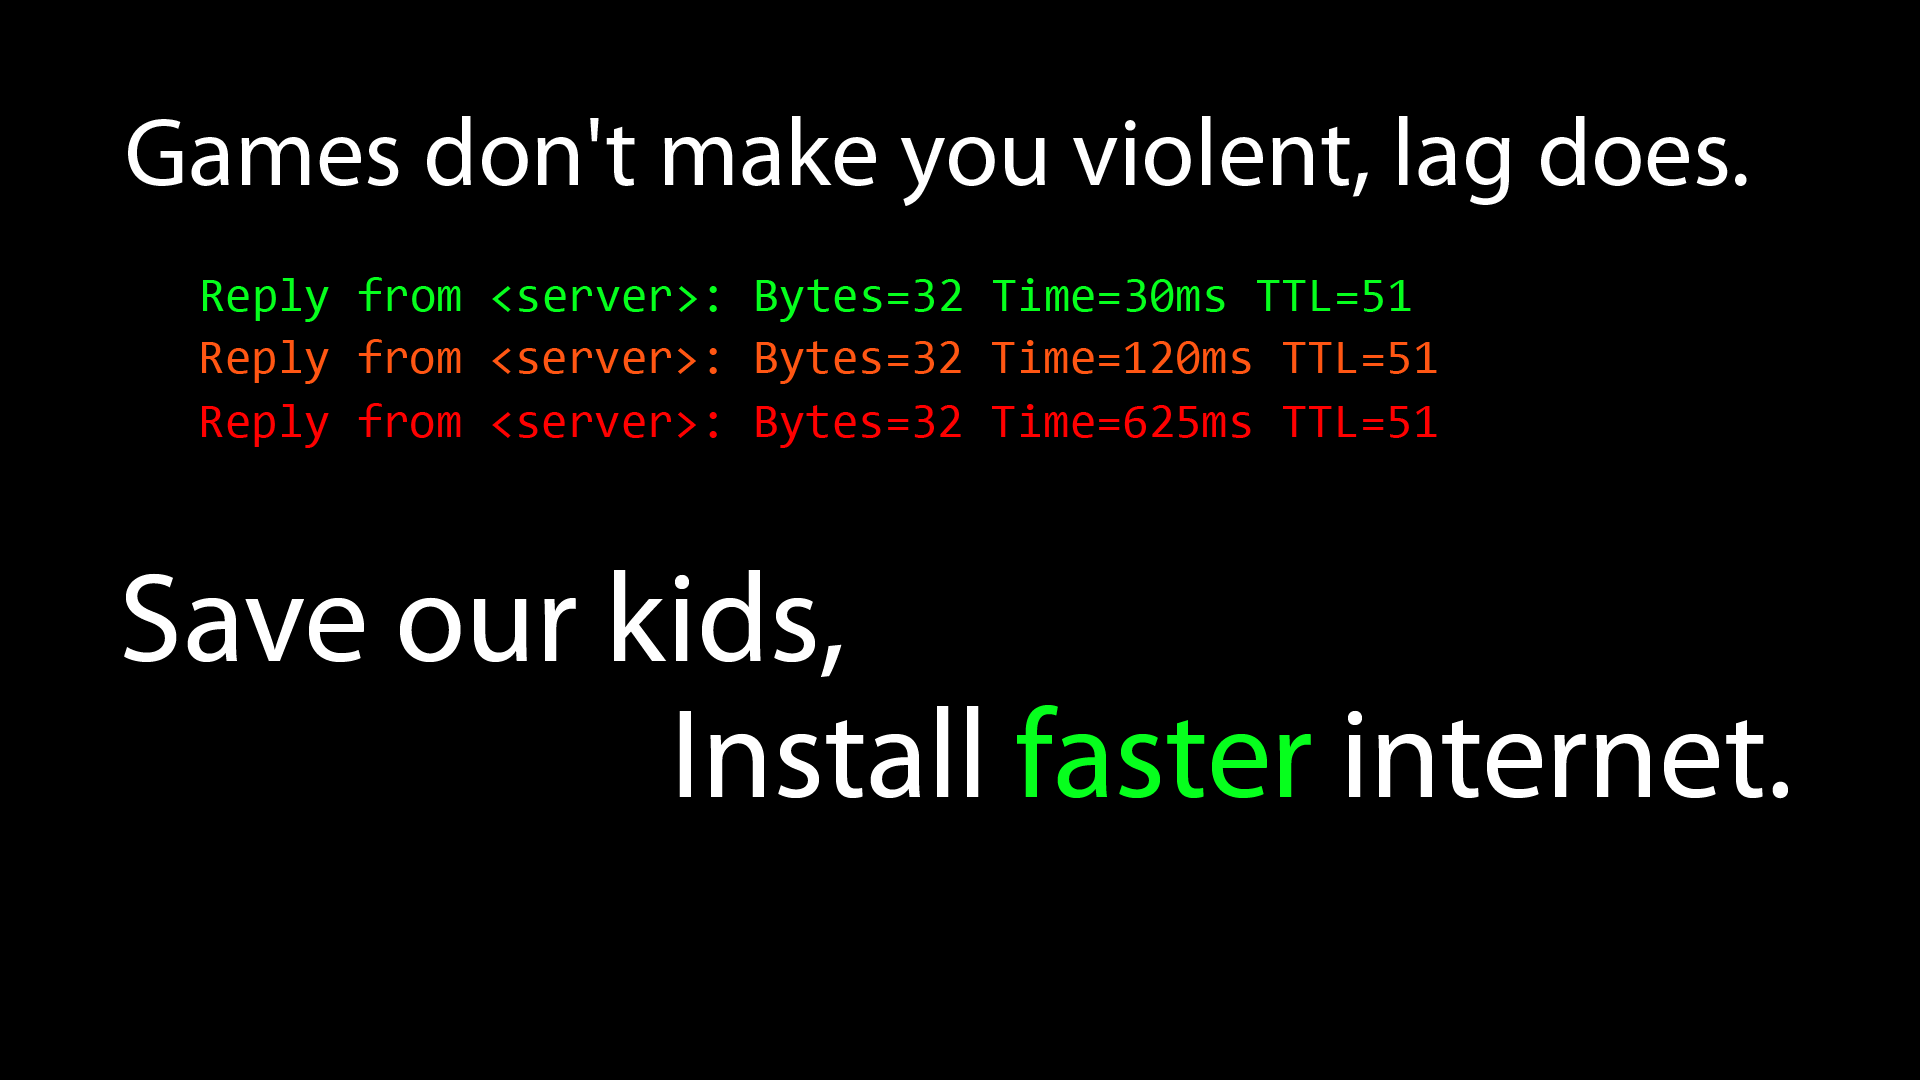 Games Quotes games don't make you violent lag does